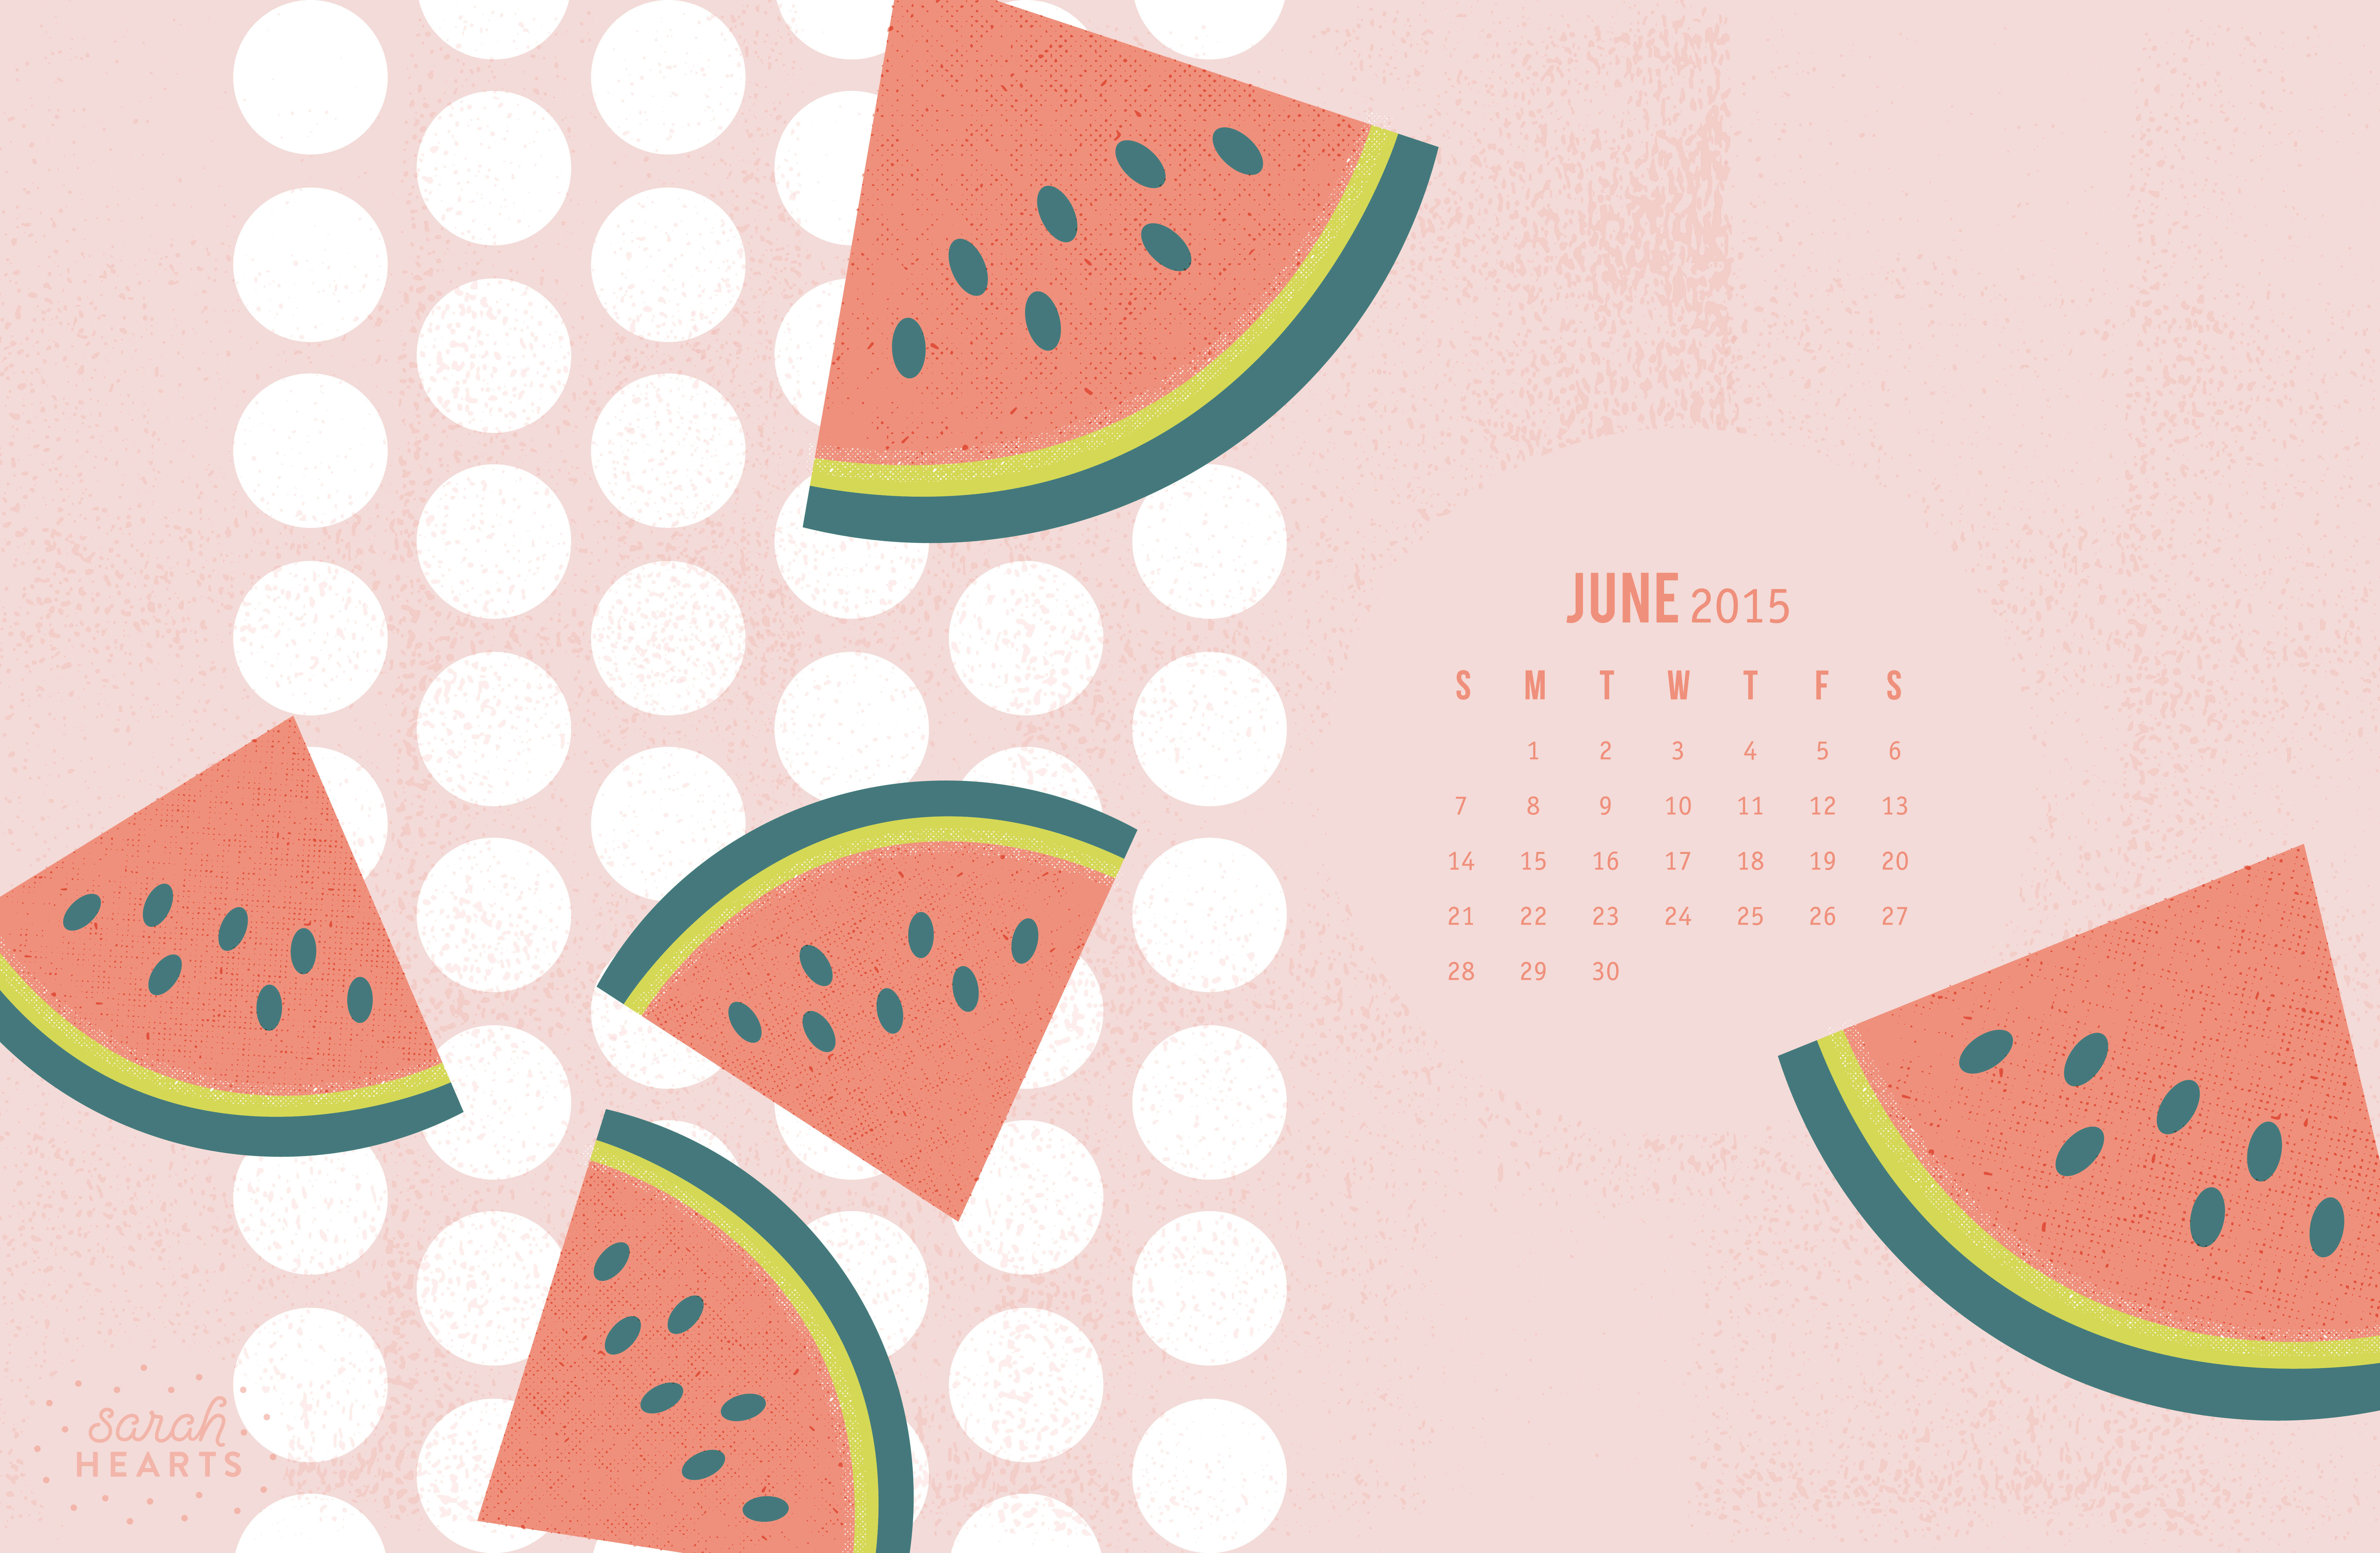 June 2015 calendar wallpaper sarah hearts for Wallpaper home 2015